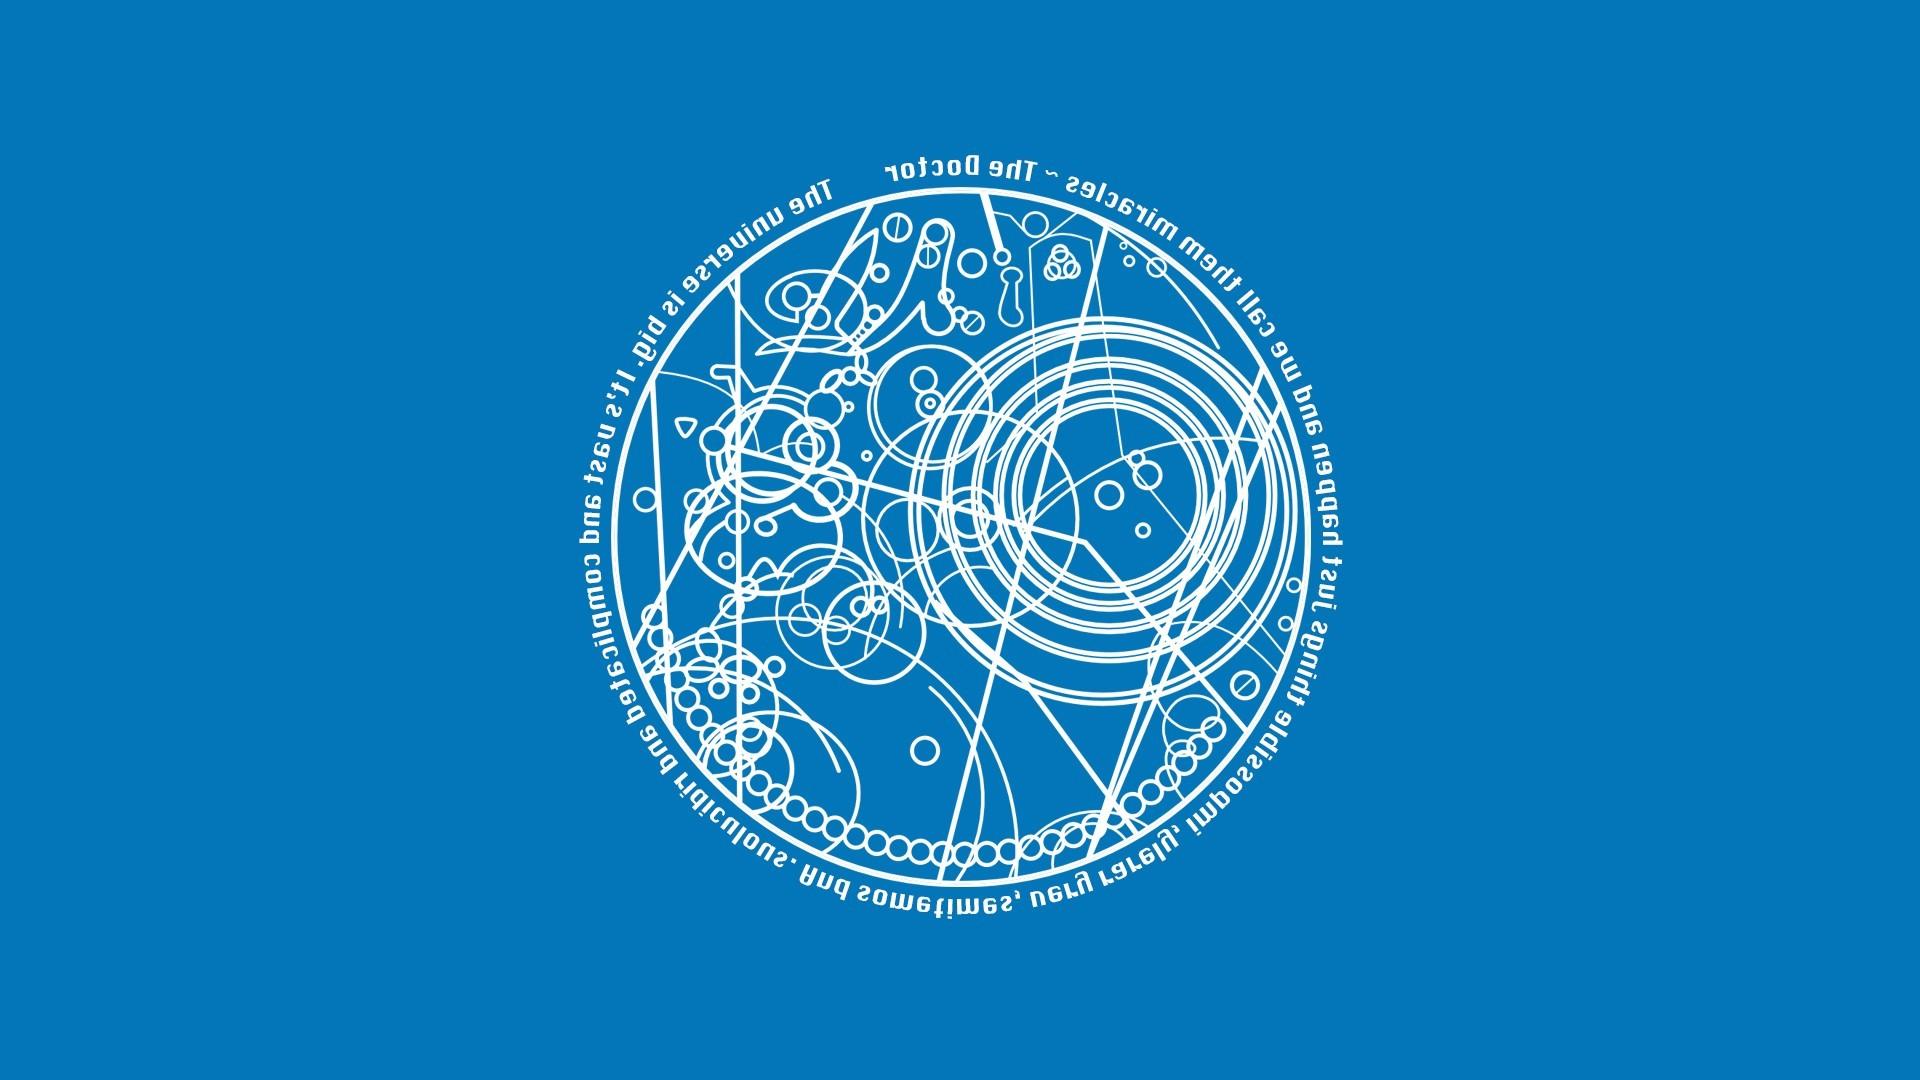 Wallpaper illustration logo pattern Doctor Who magic circle